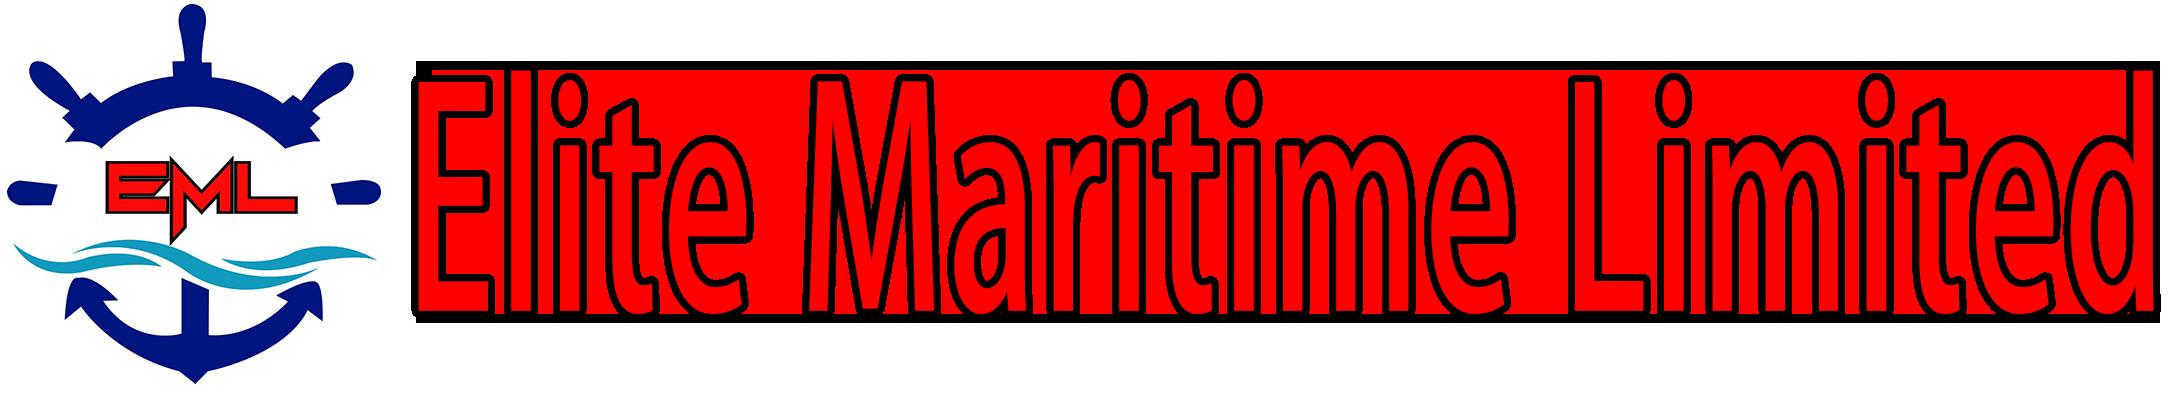 Elite Maritime Limited